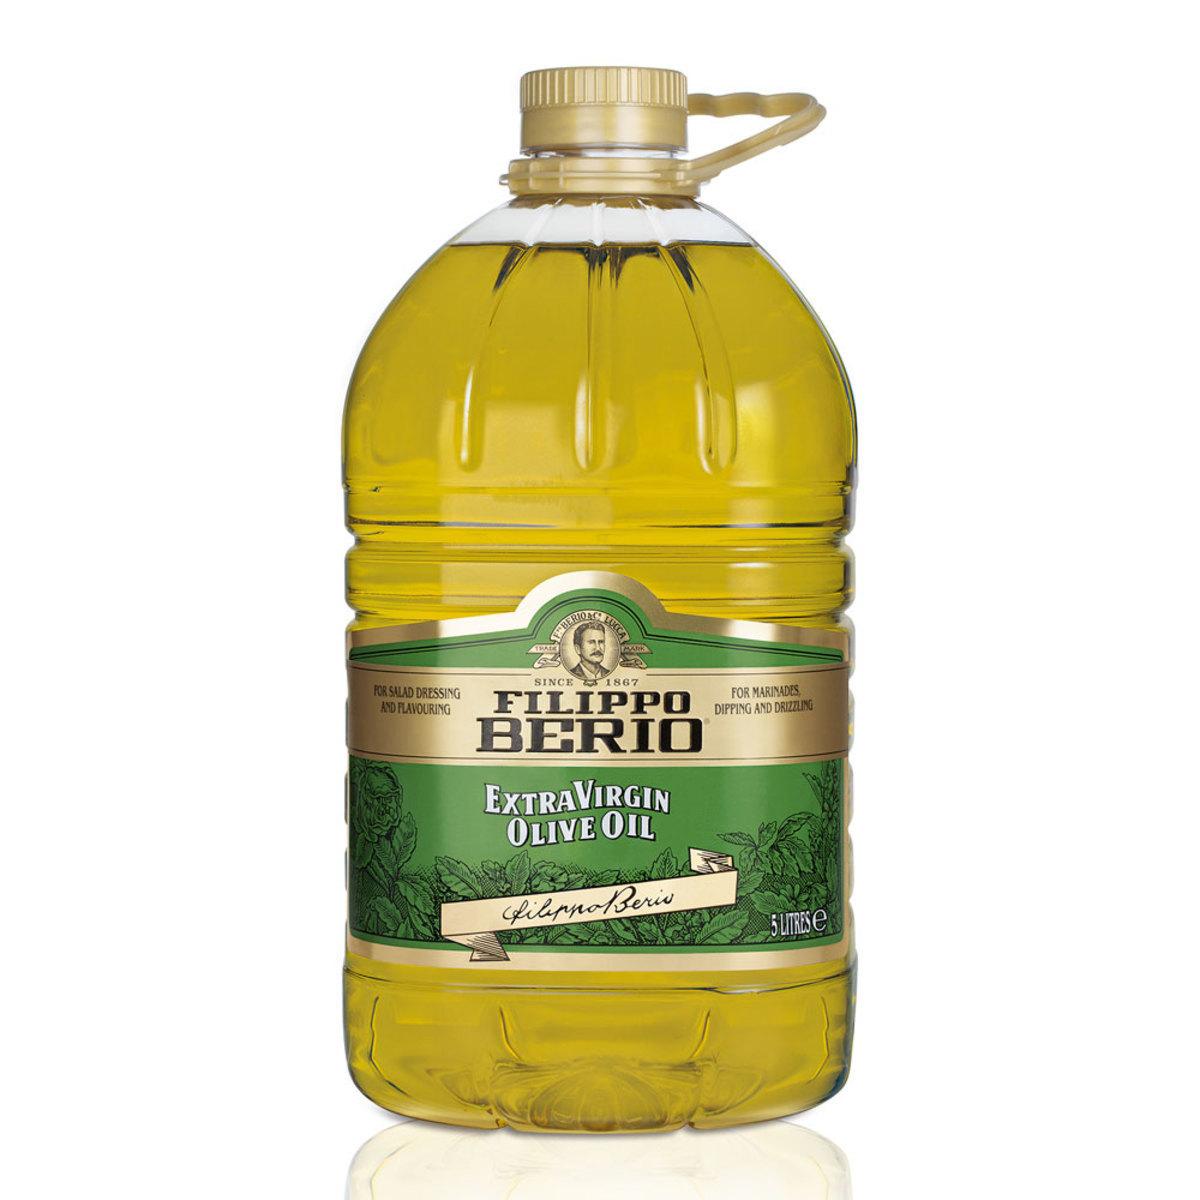 Filippo Berio Extra Virgin Olive Oil 5 Litres for £15.99 at Costco